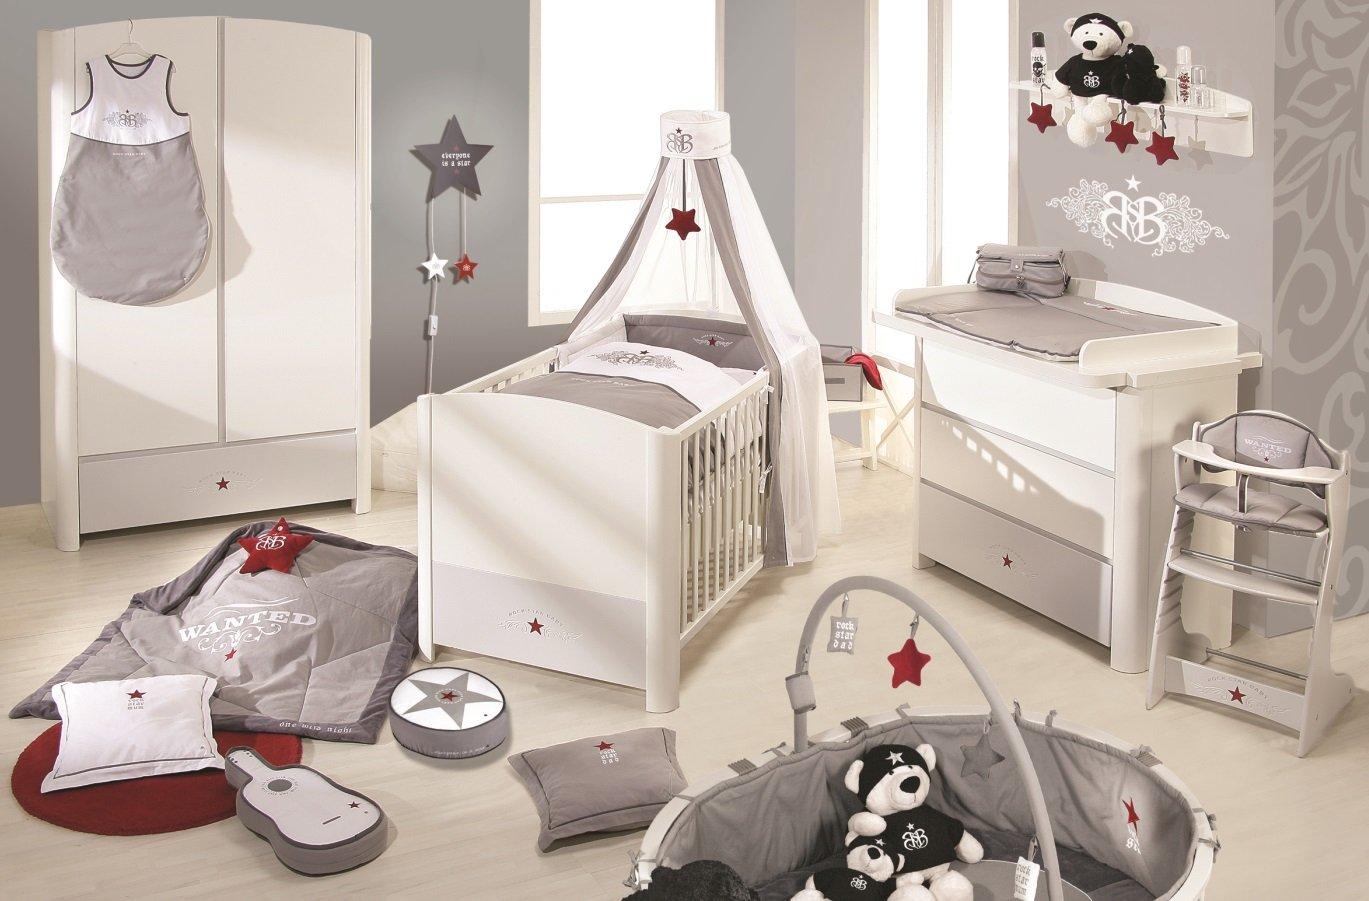 Roba 38101 - RSB Kinderzimmer Komplett-Set mit 3-türigem Schrank ...